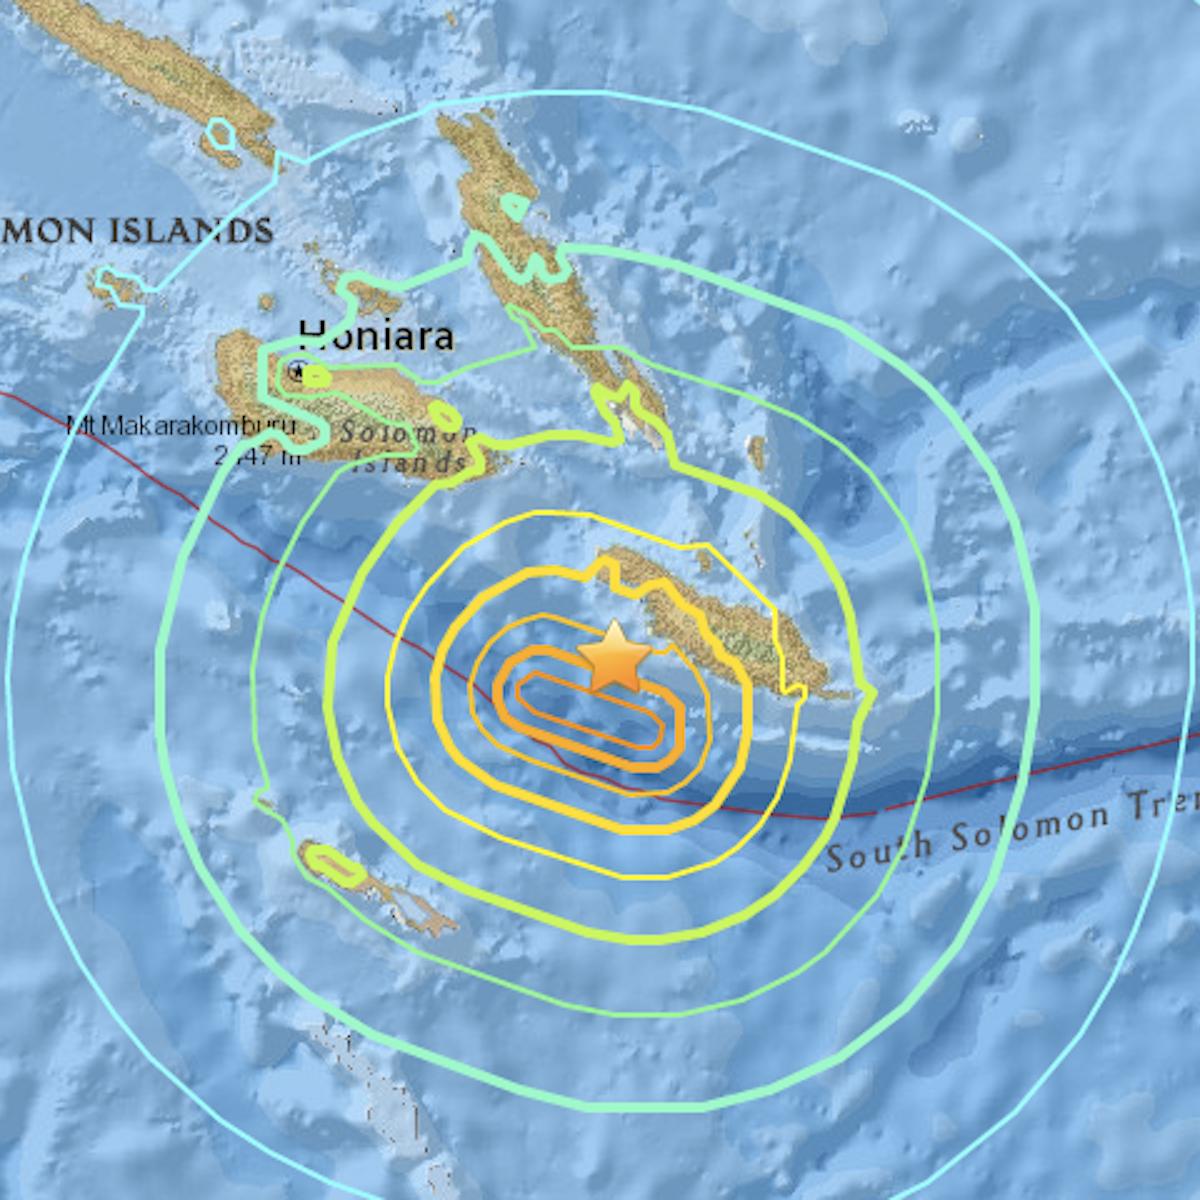 Pacific nations lose shortwave radio services that evade dictators